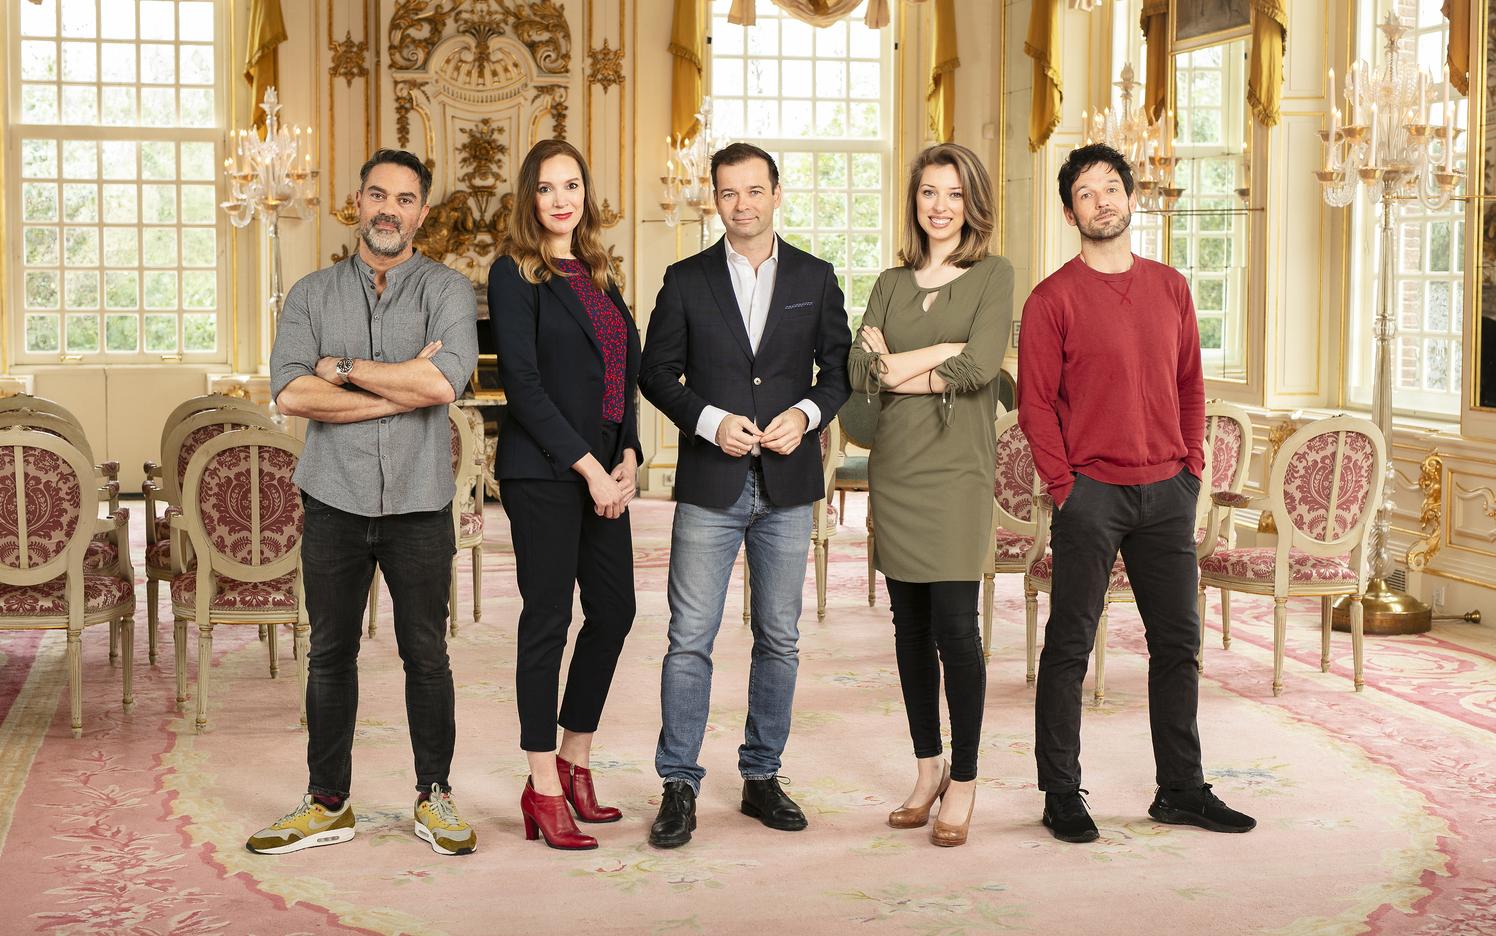 RTL krijgt recordaantal aanmeldingen 'Married At First Sight'